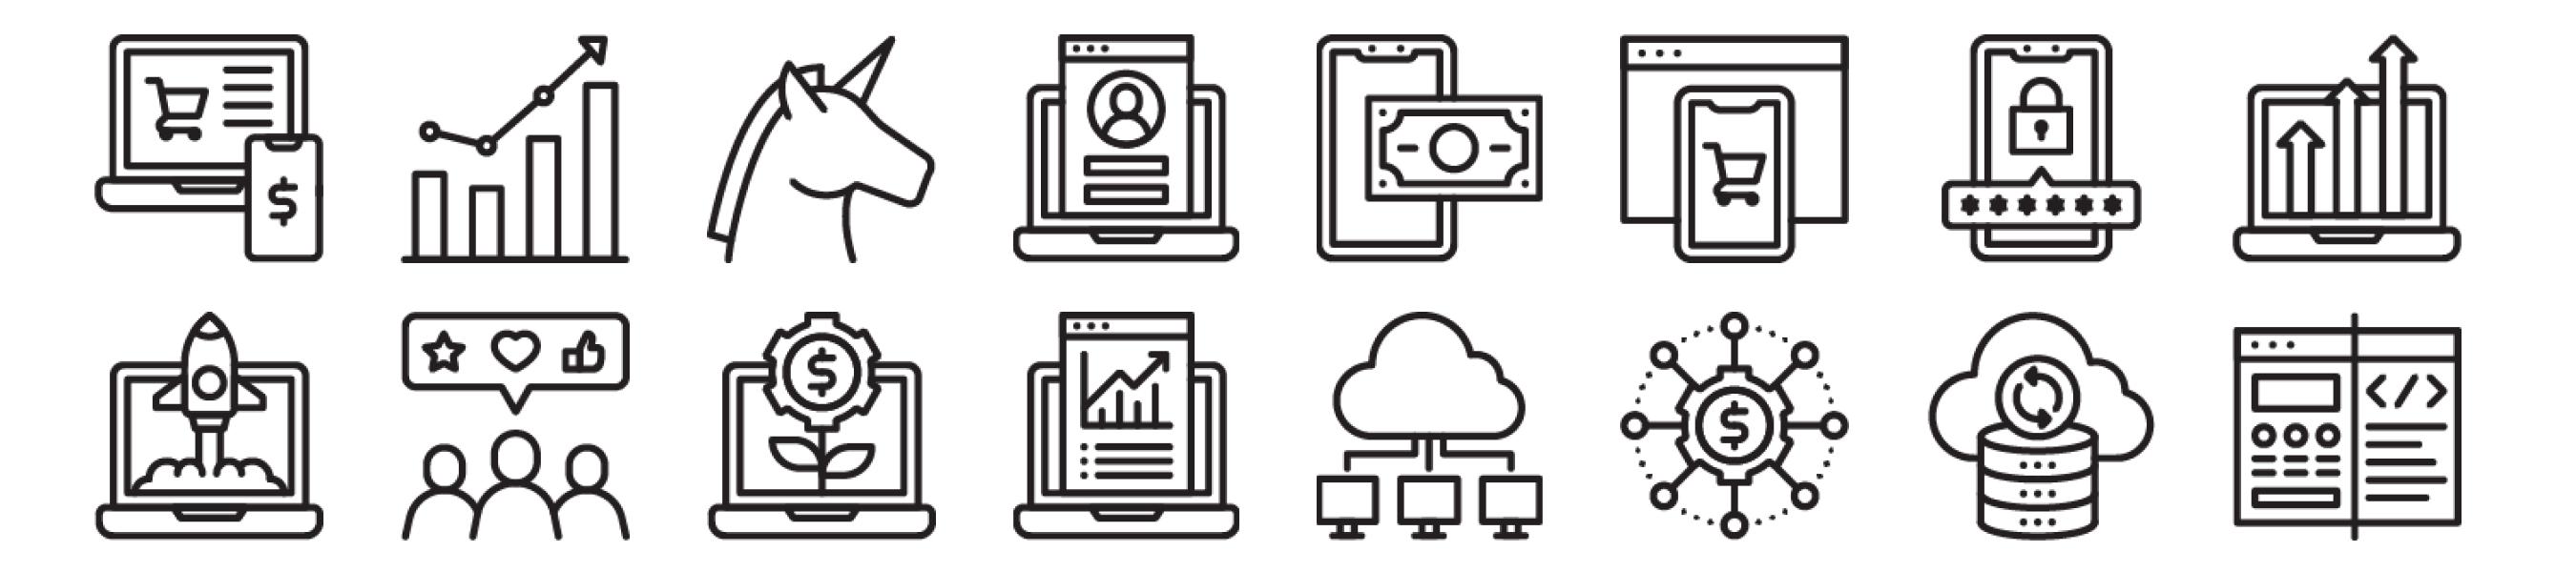 Startups and SaaS Icons